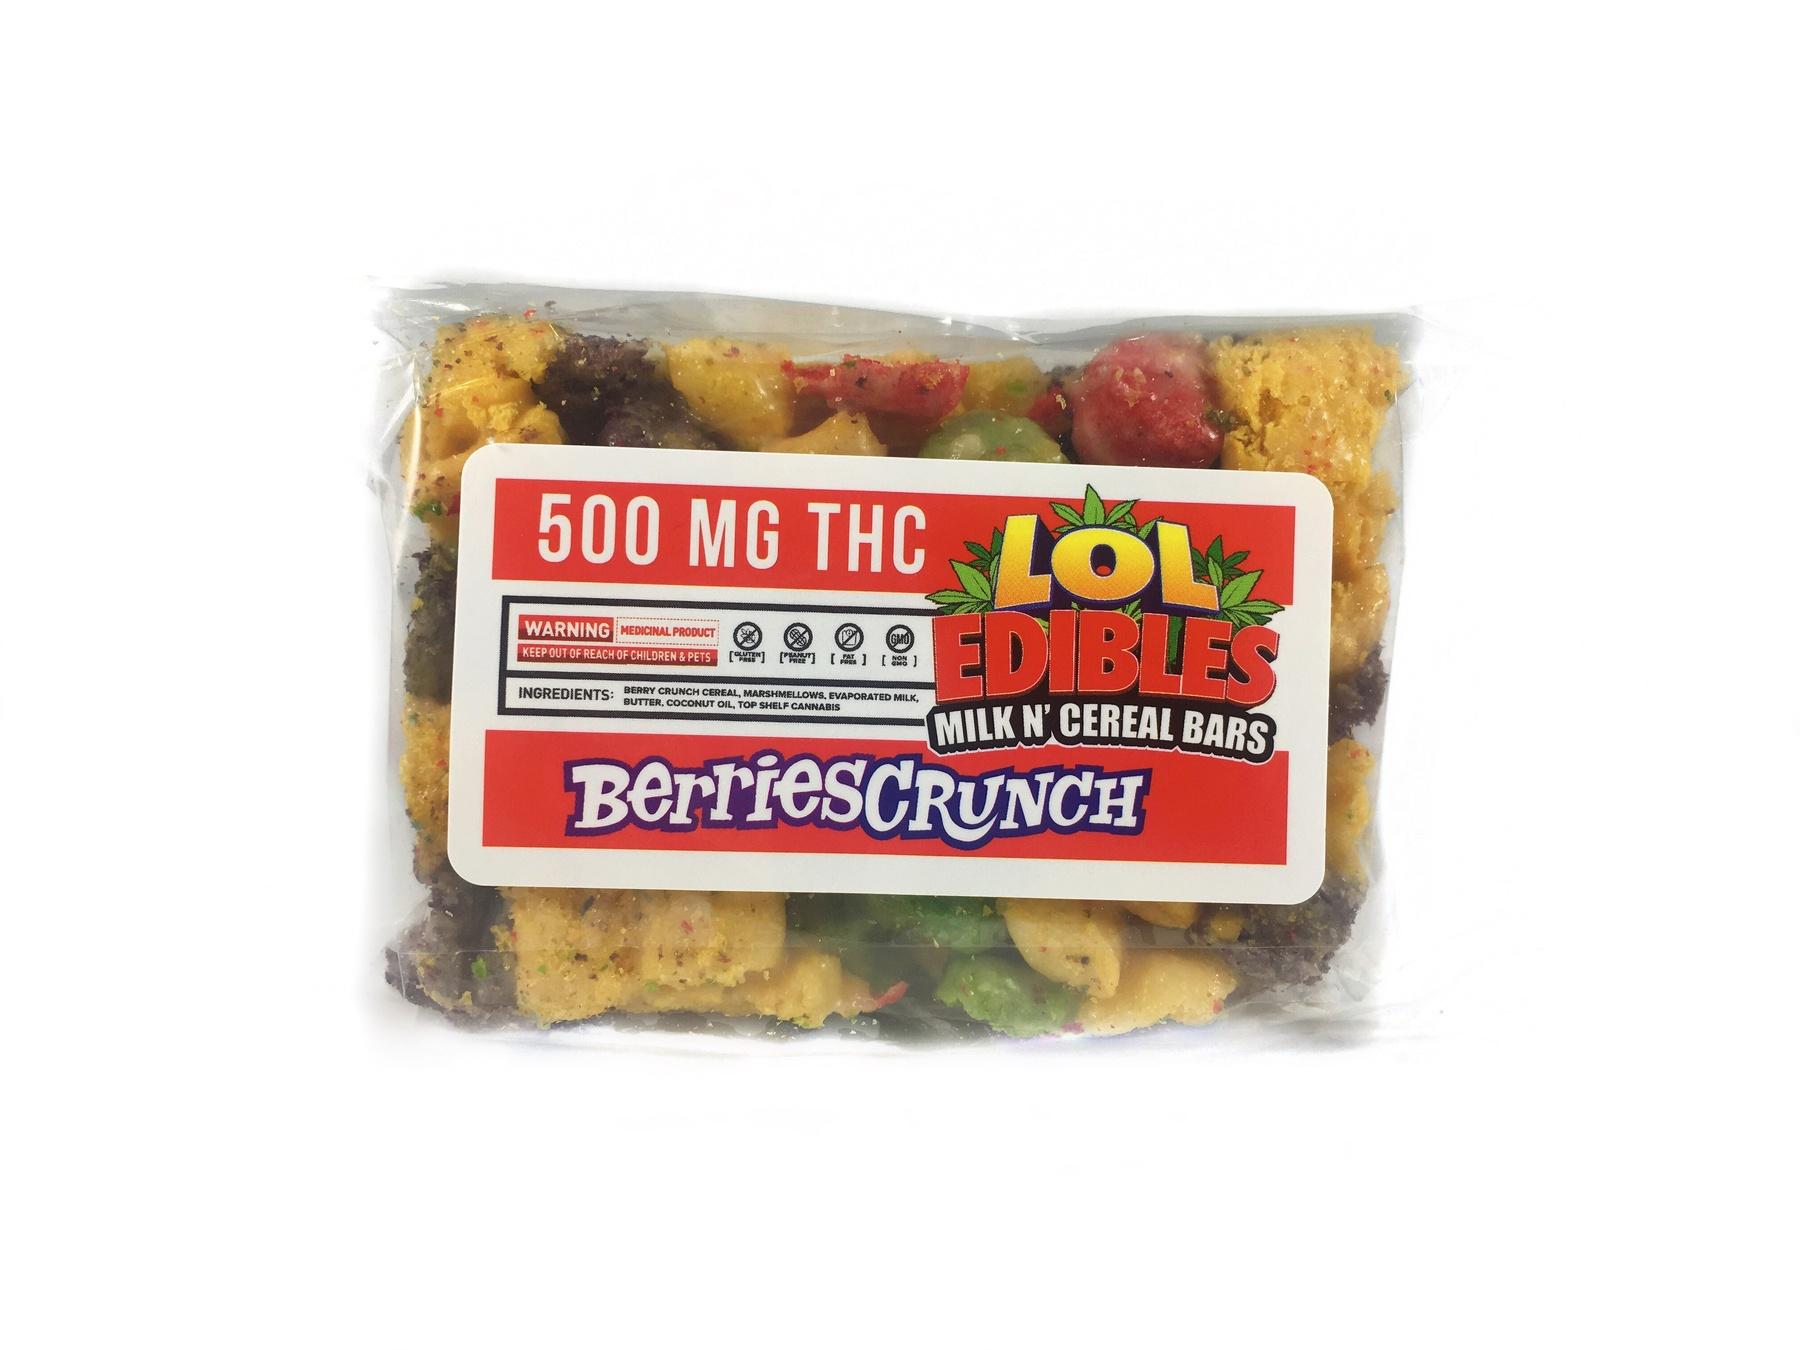 Marijuana edible lol edibles berries crunch bar 500 mg higher lol edibles berries crunch bar 500 mg product image ccuart Image collections